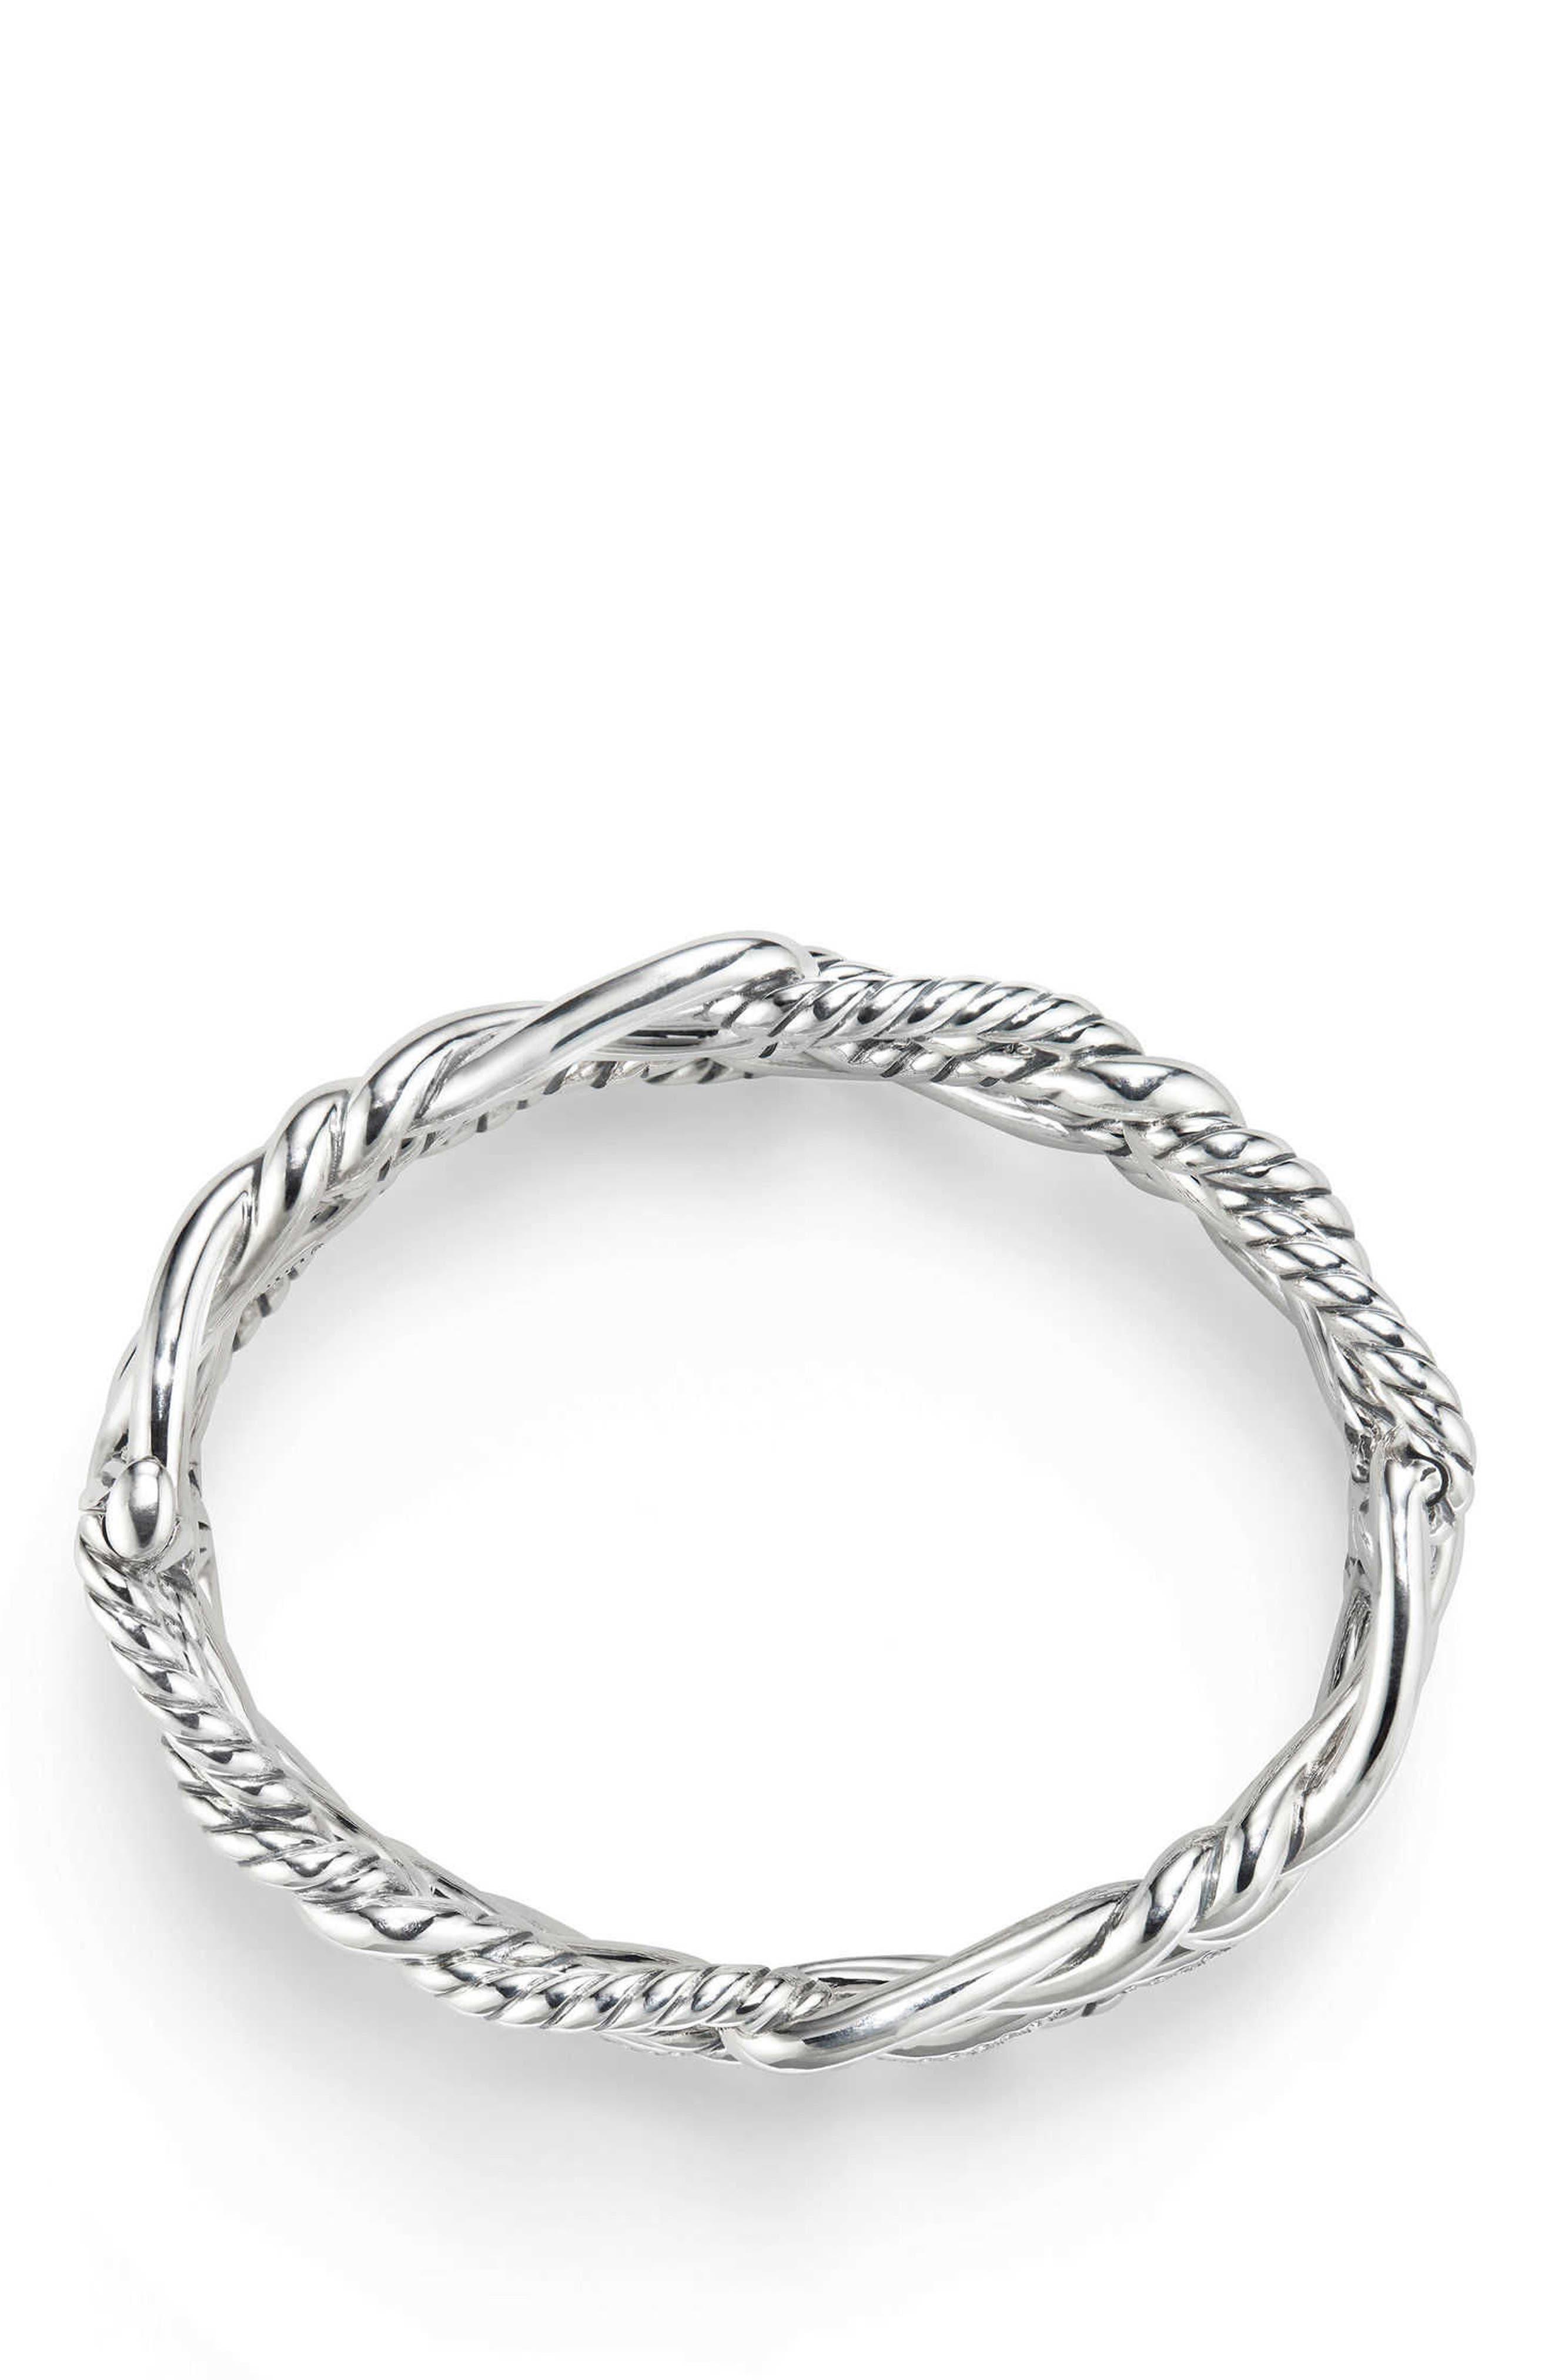 Continuance Multi Row Cuff Bracelet with Diamonds,                             Alternate thumbnail 2, color,                             SILVER/ DIAMOND